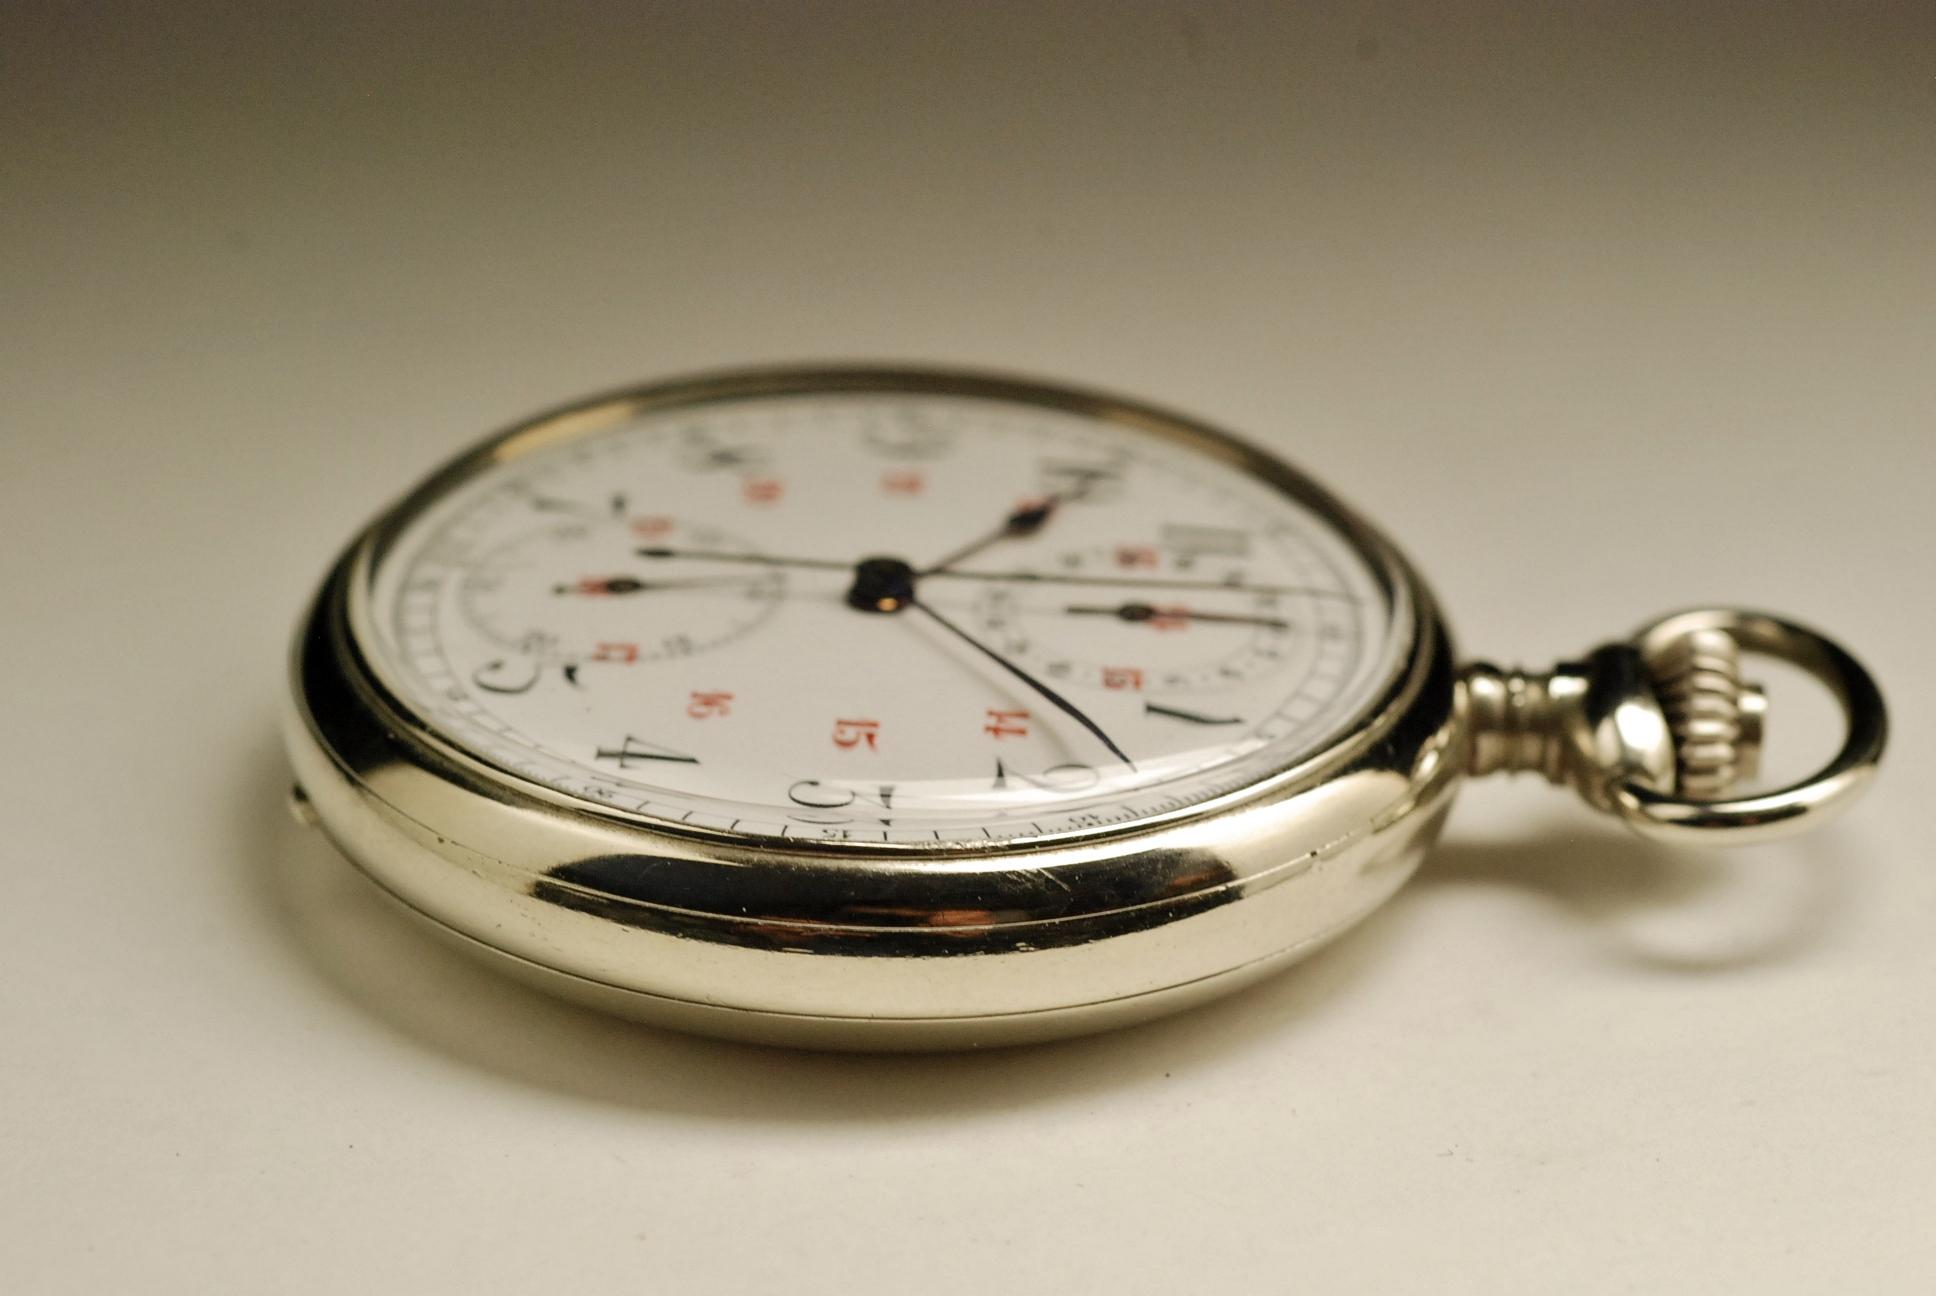 ancienne montre gousset le phare chronographe 1910 vintage. Black Bedroom Furniture Sets. Home Design Ideas